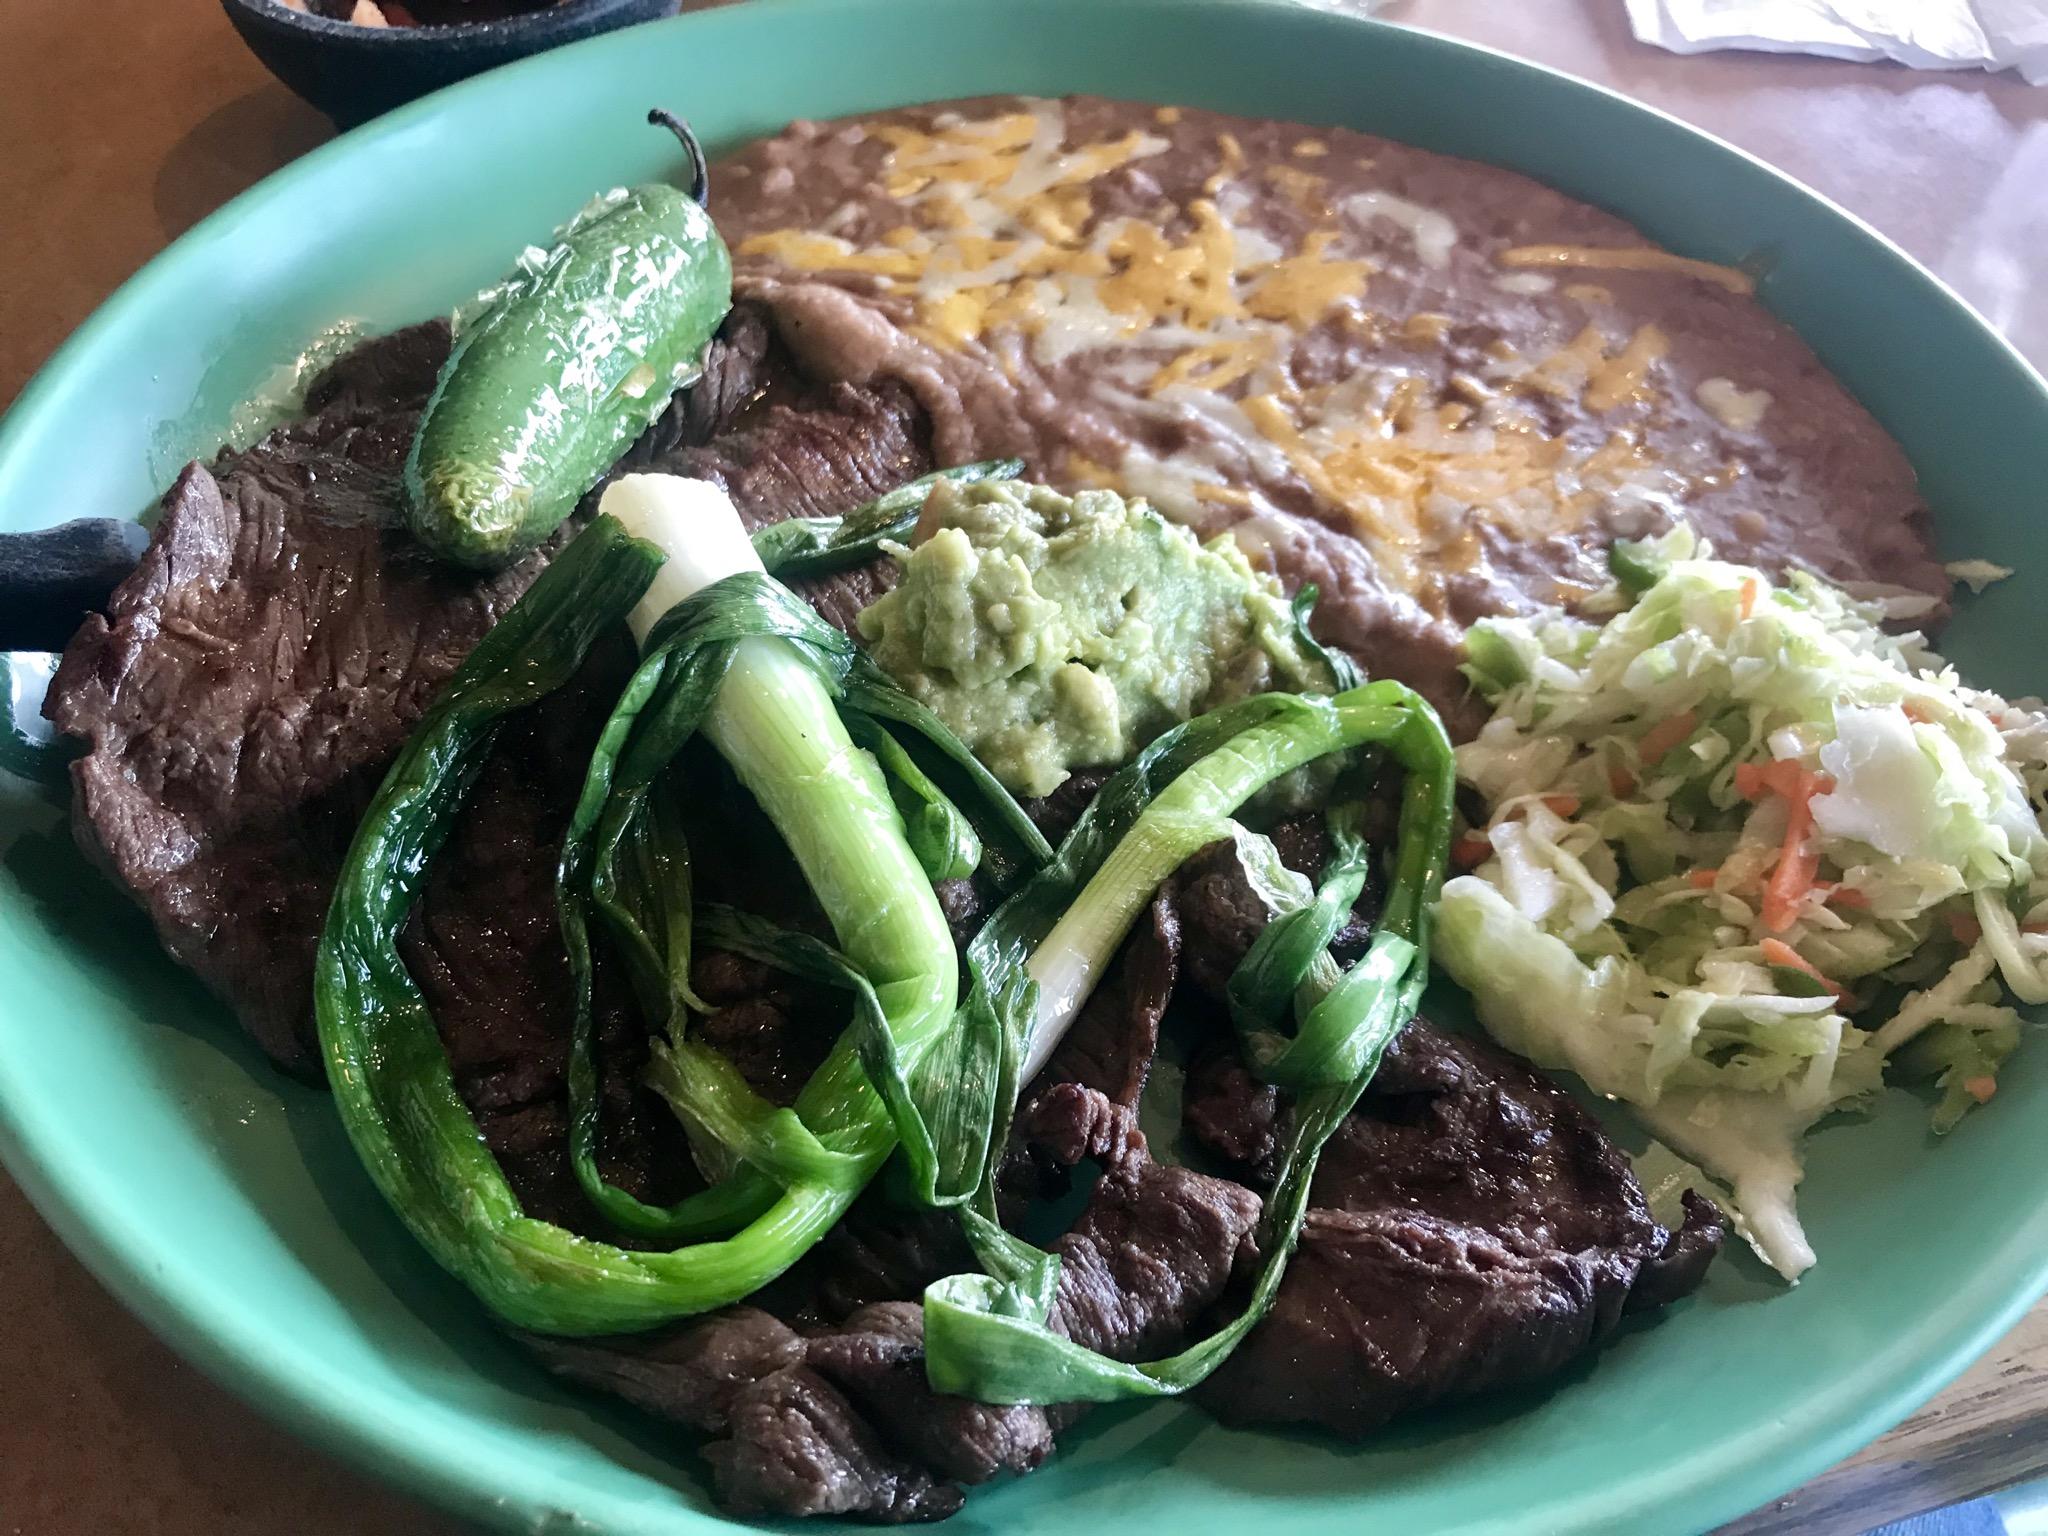 The Carne Asada at Inca Mexican Restaurant in Richland - November 27 2018